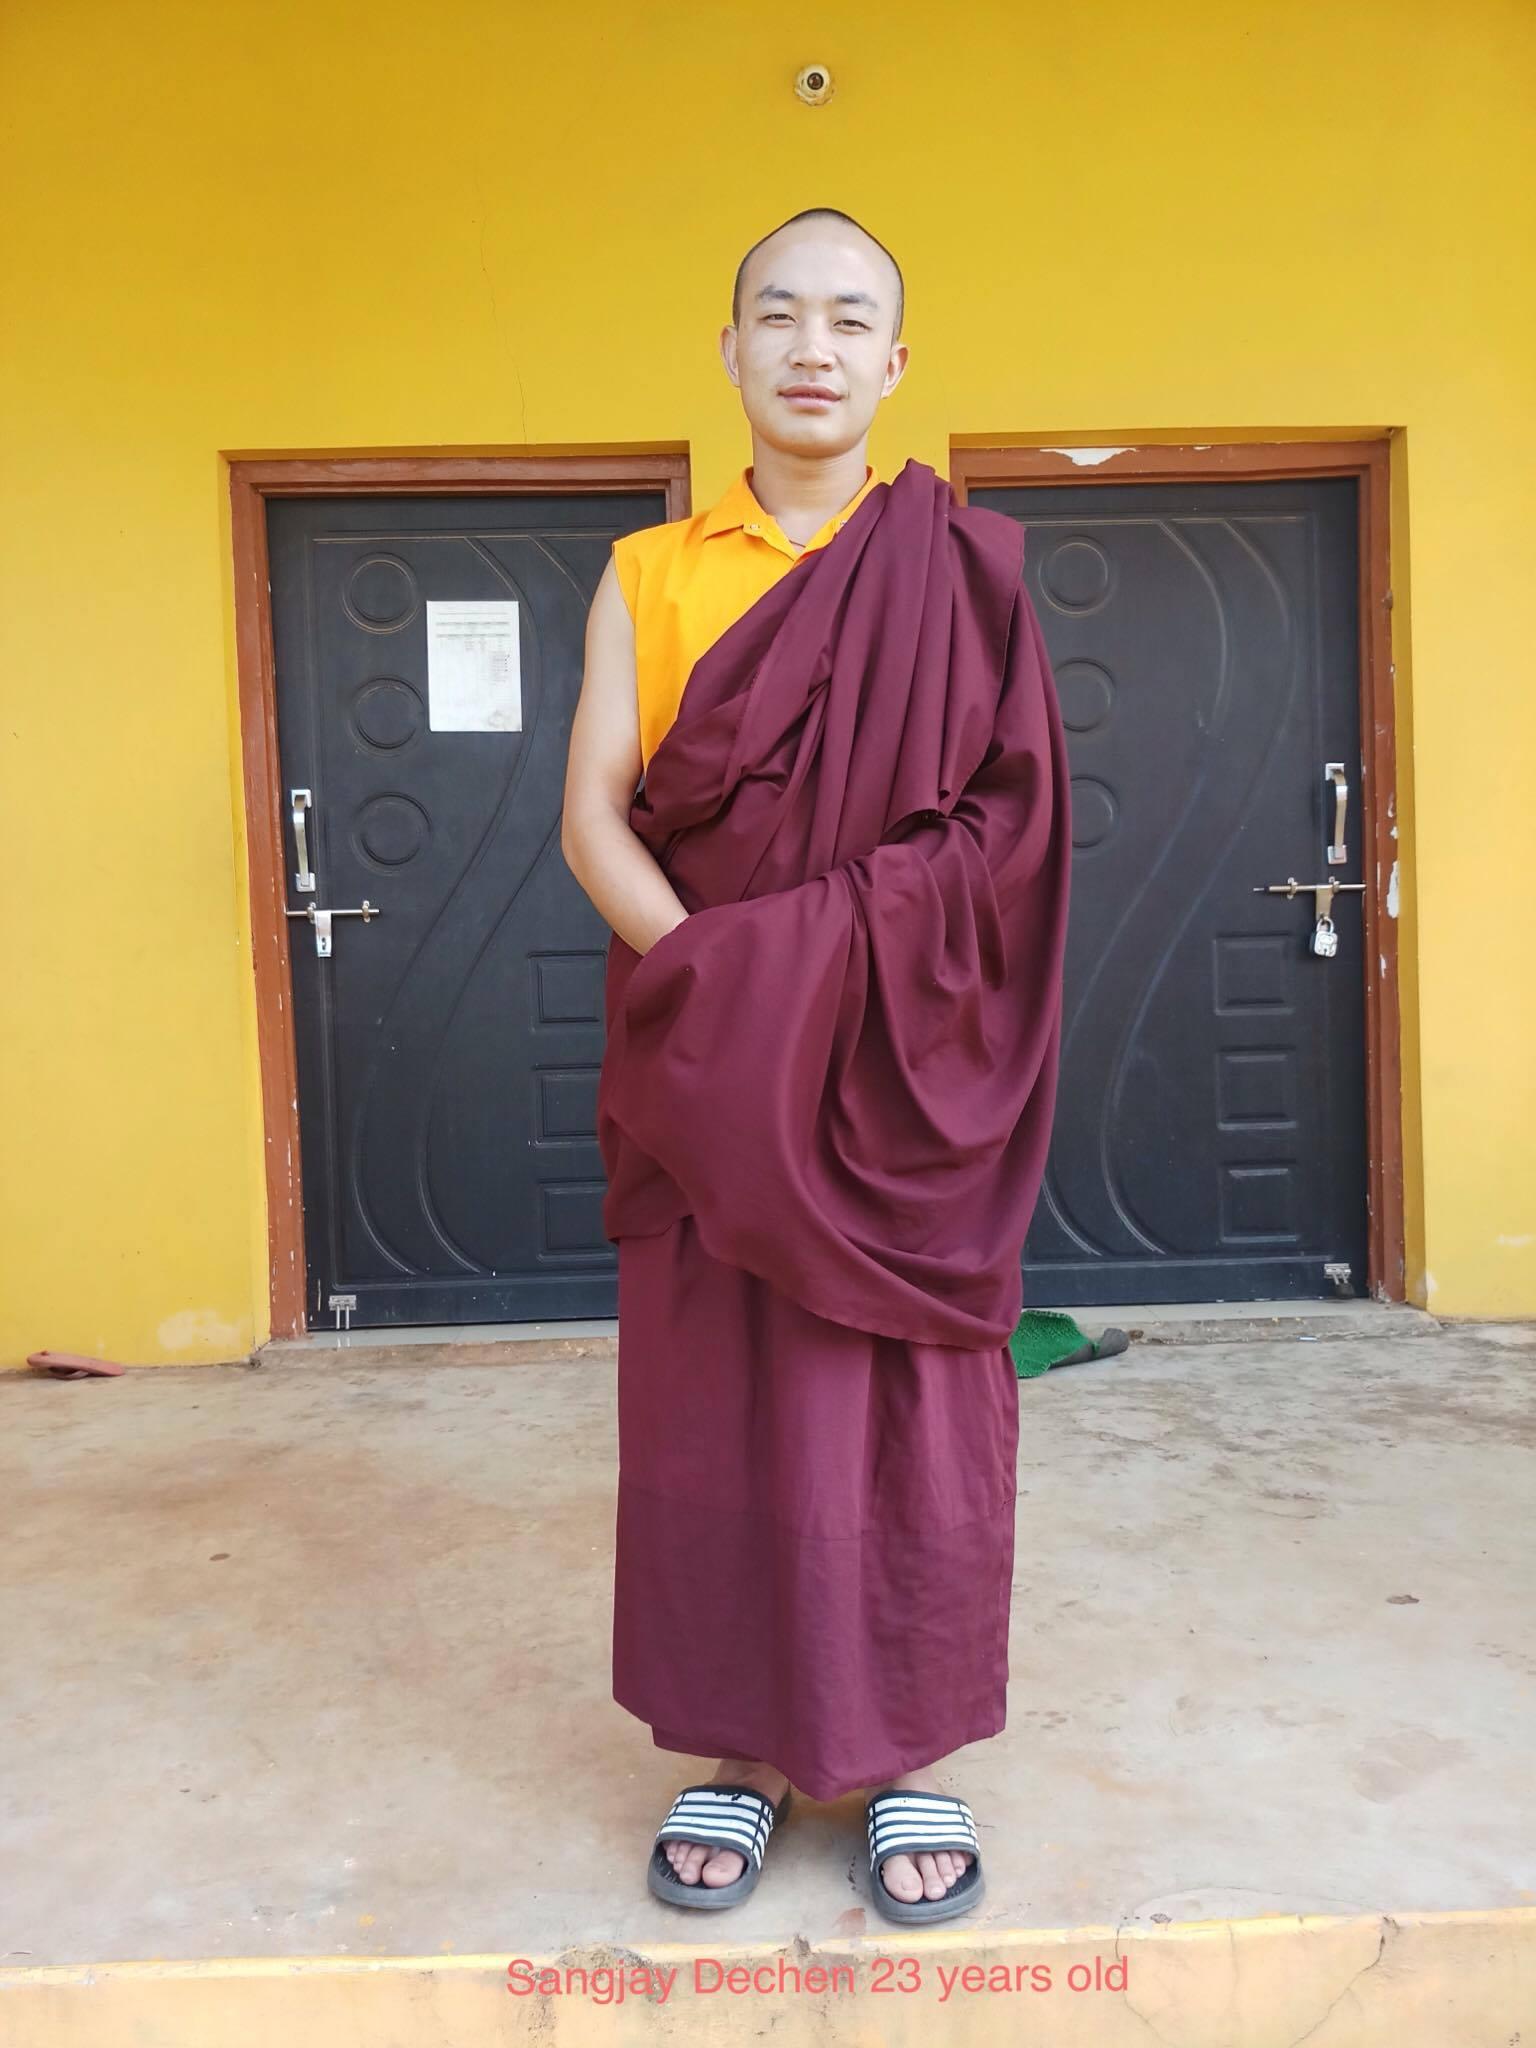 Monk_Sanjay_Dechen_23yrs_old.jpg